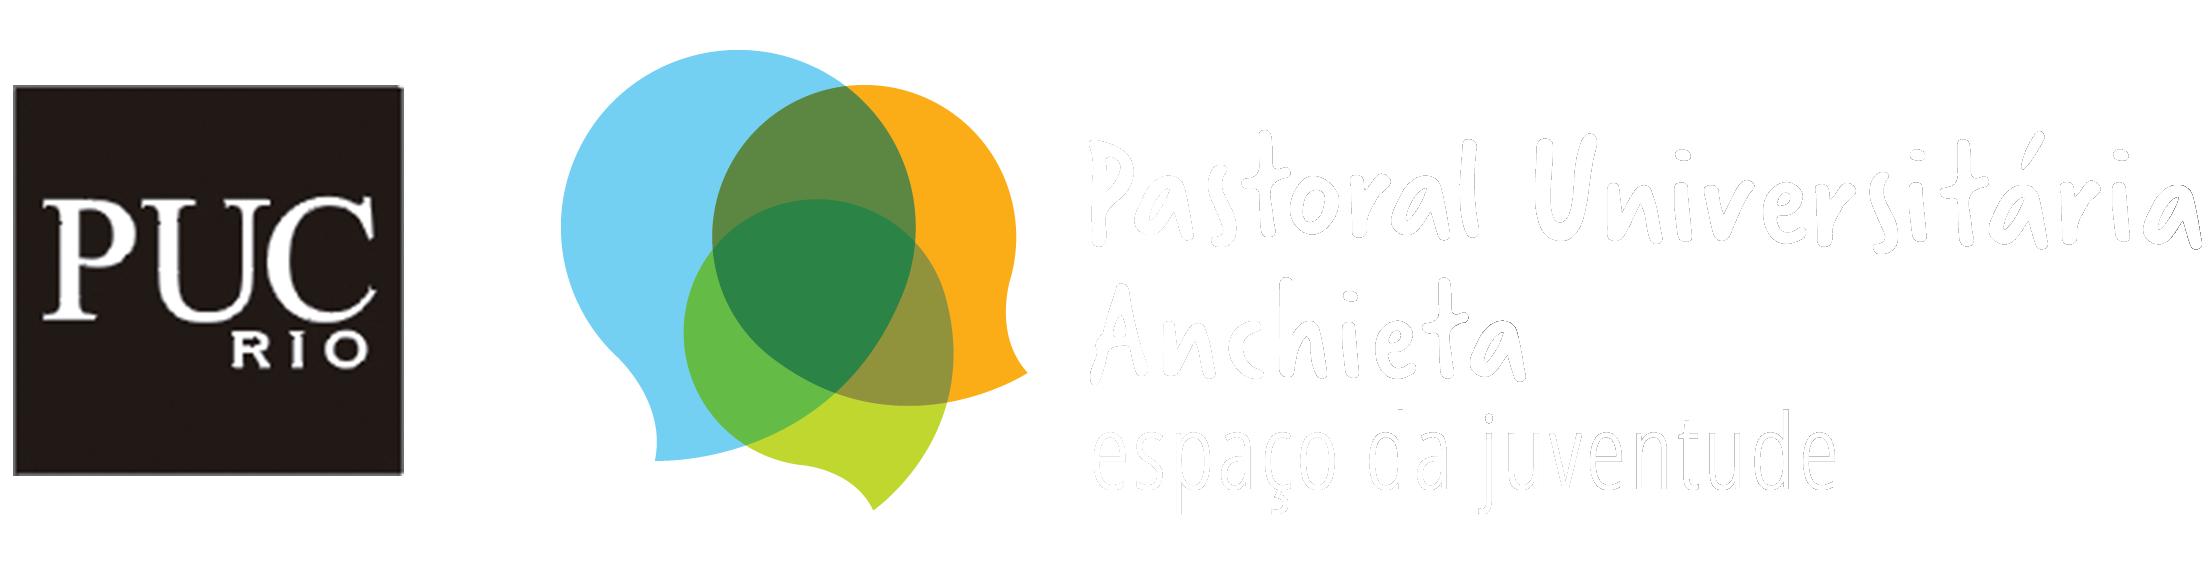 Pastoral Universitária Anchieta – PUC-Rio